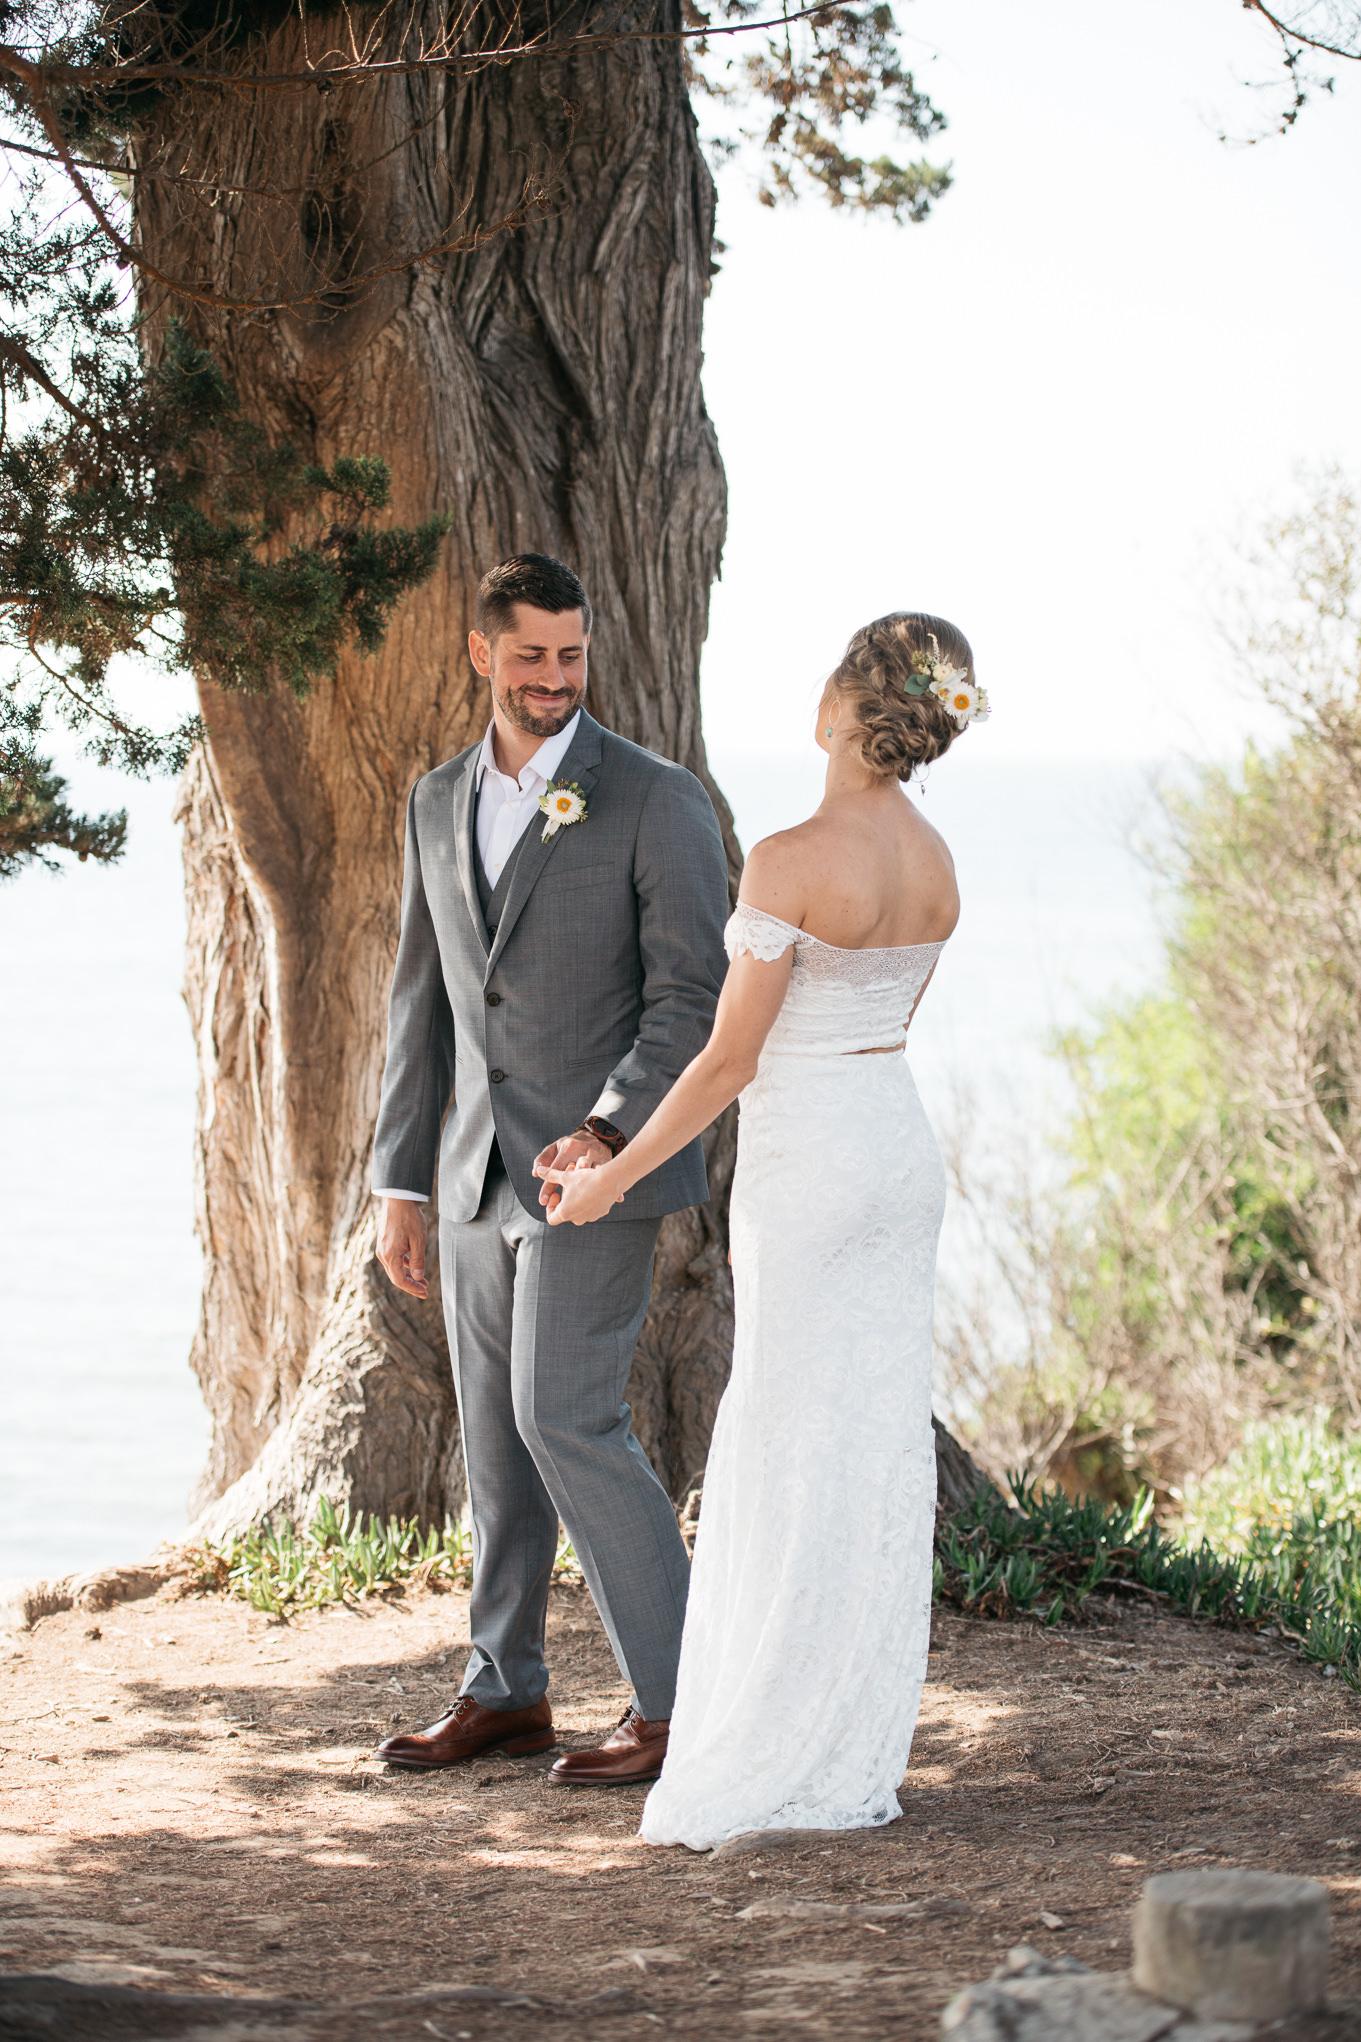 067_ONL_Jenny_Ken_Wedding_Trevor_Hooper_Photo.jpg